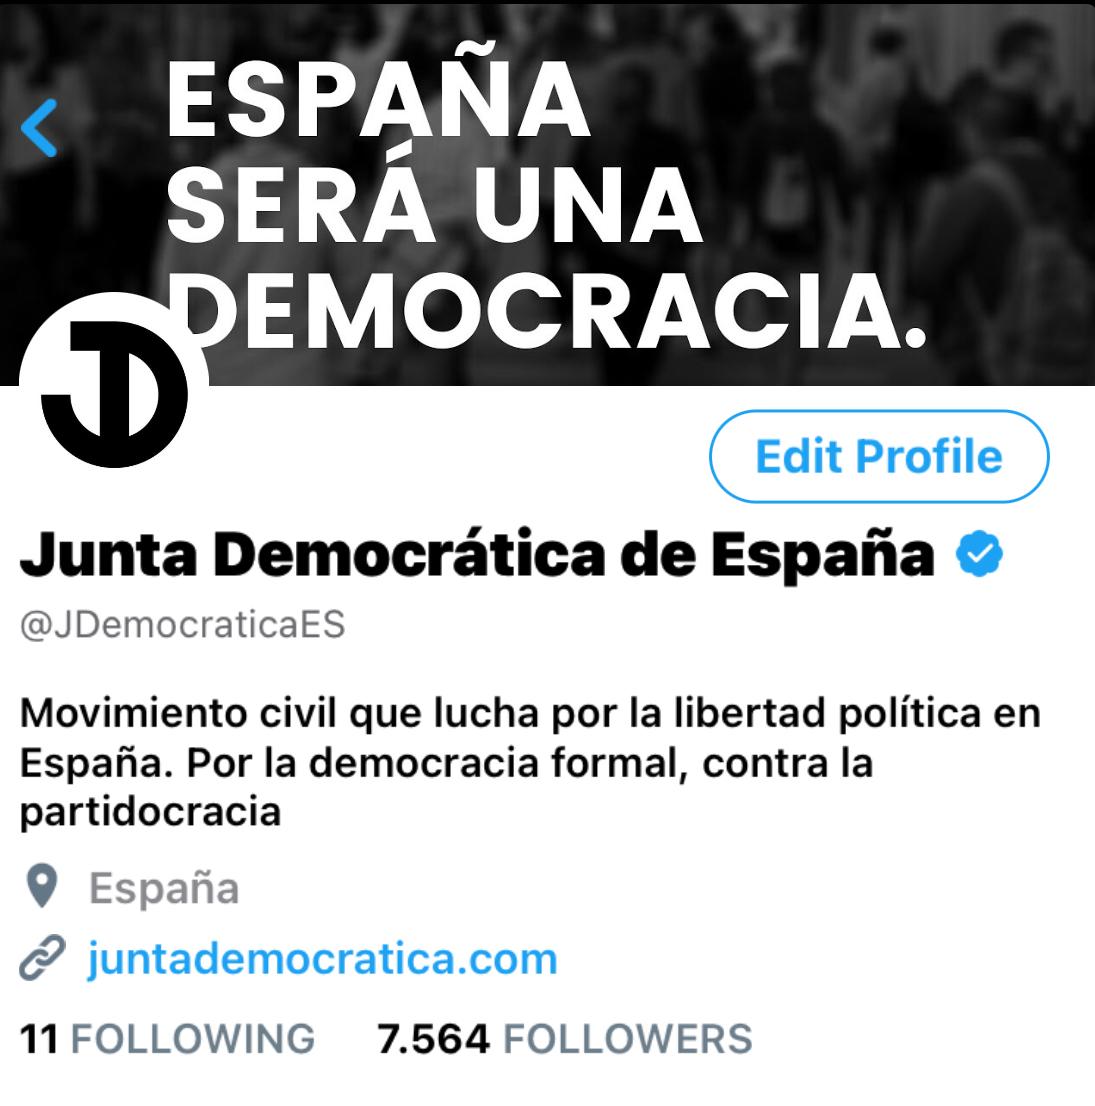 @JDemocraticaES | Twitter 6c96fb10